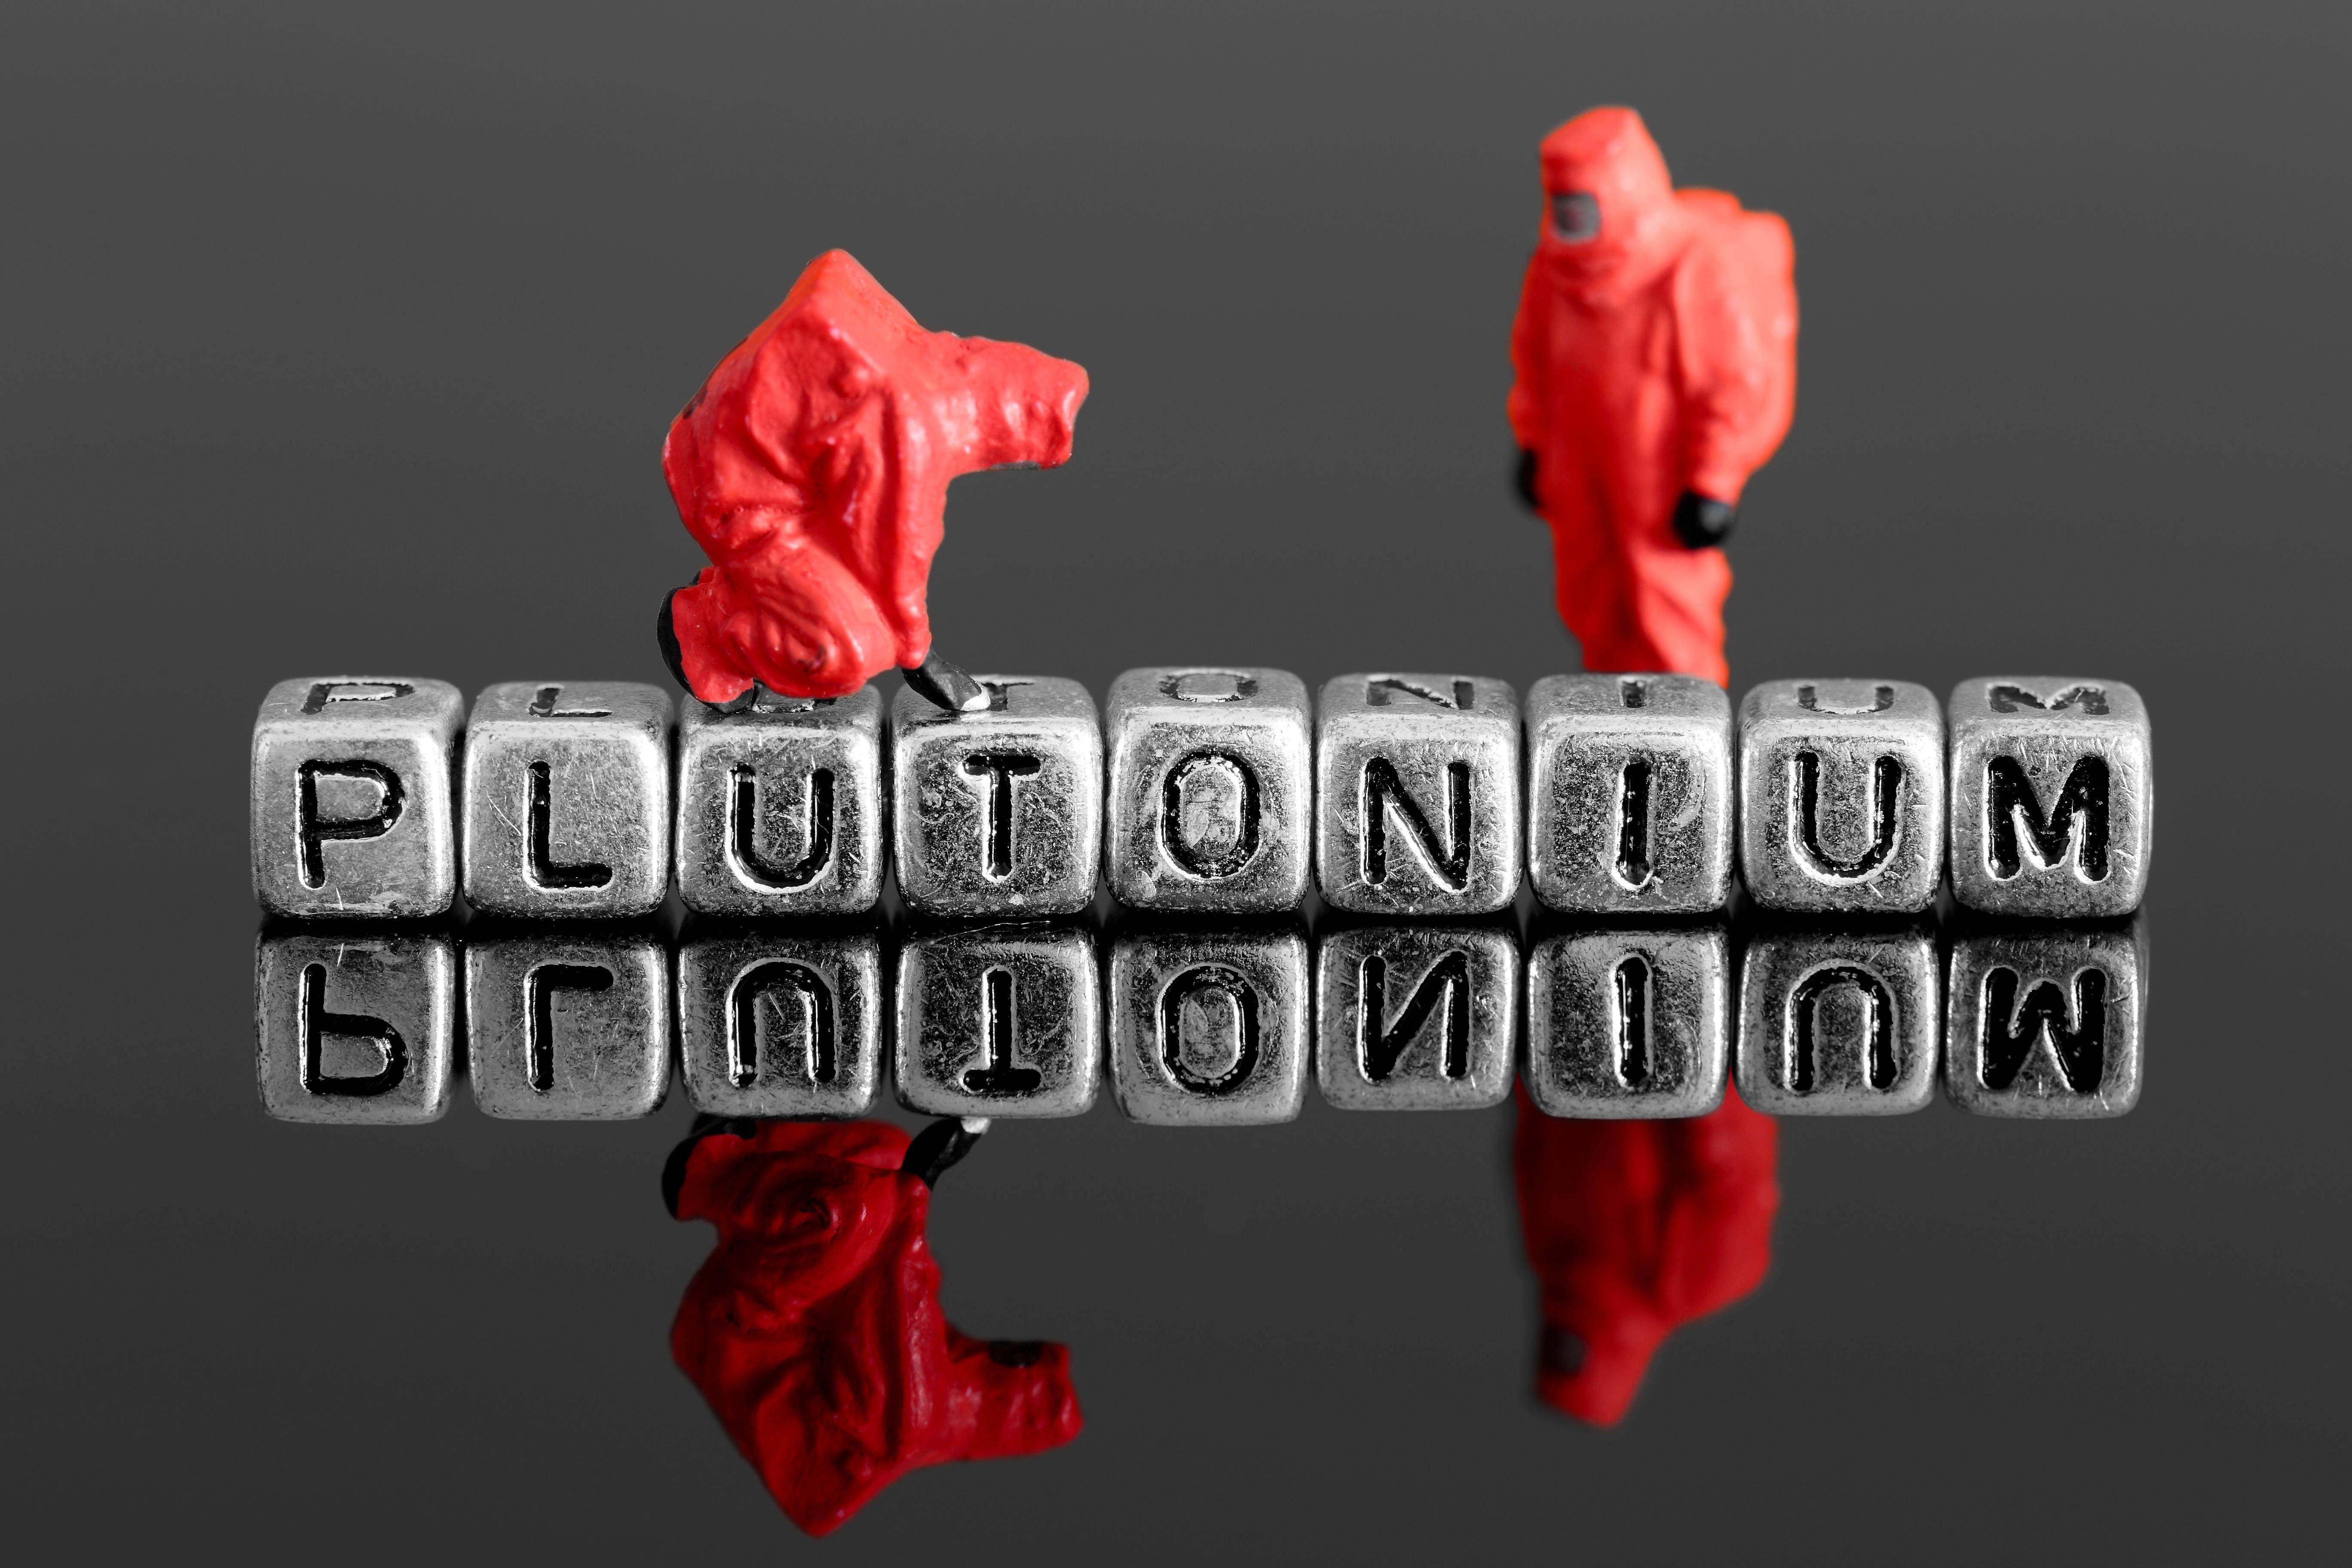 plutonium-toys-shutterstock_634783541.jpg